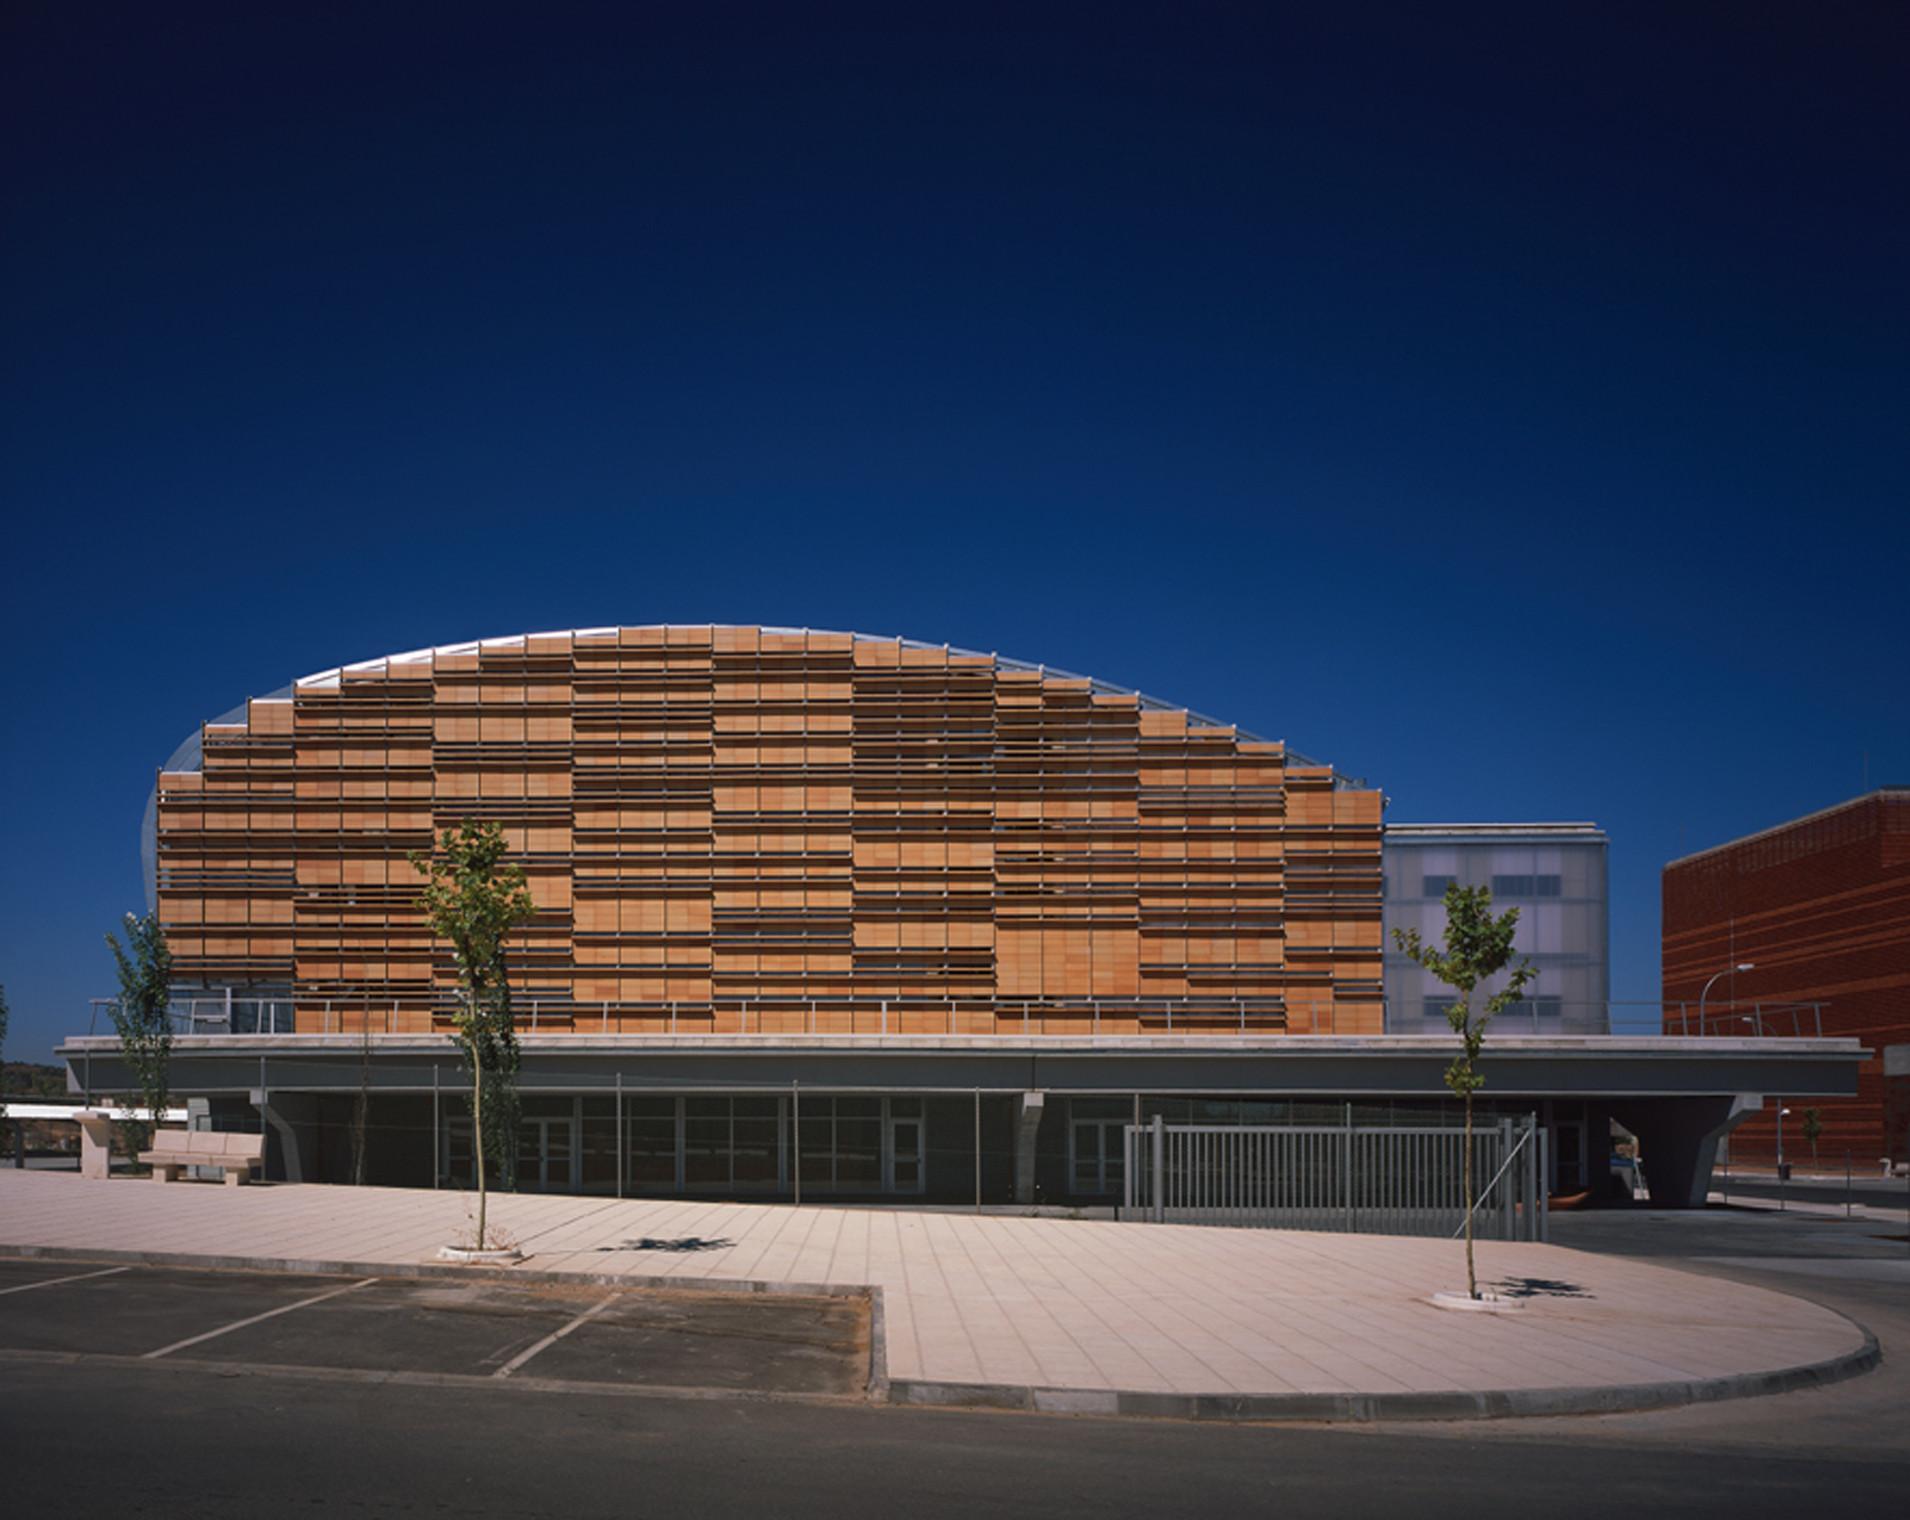 Telefónica Móviles Building / Pich-Aguilera Architects